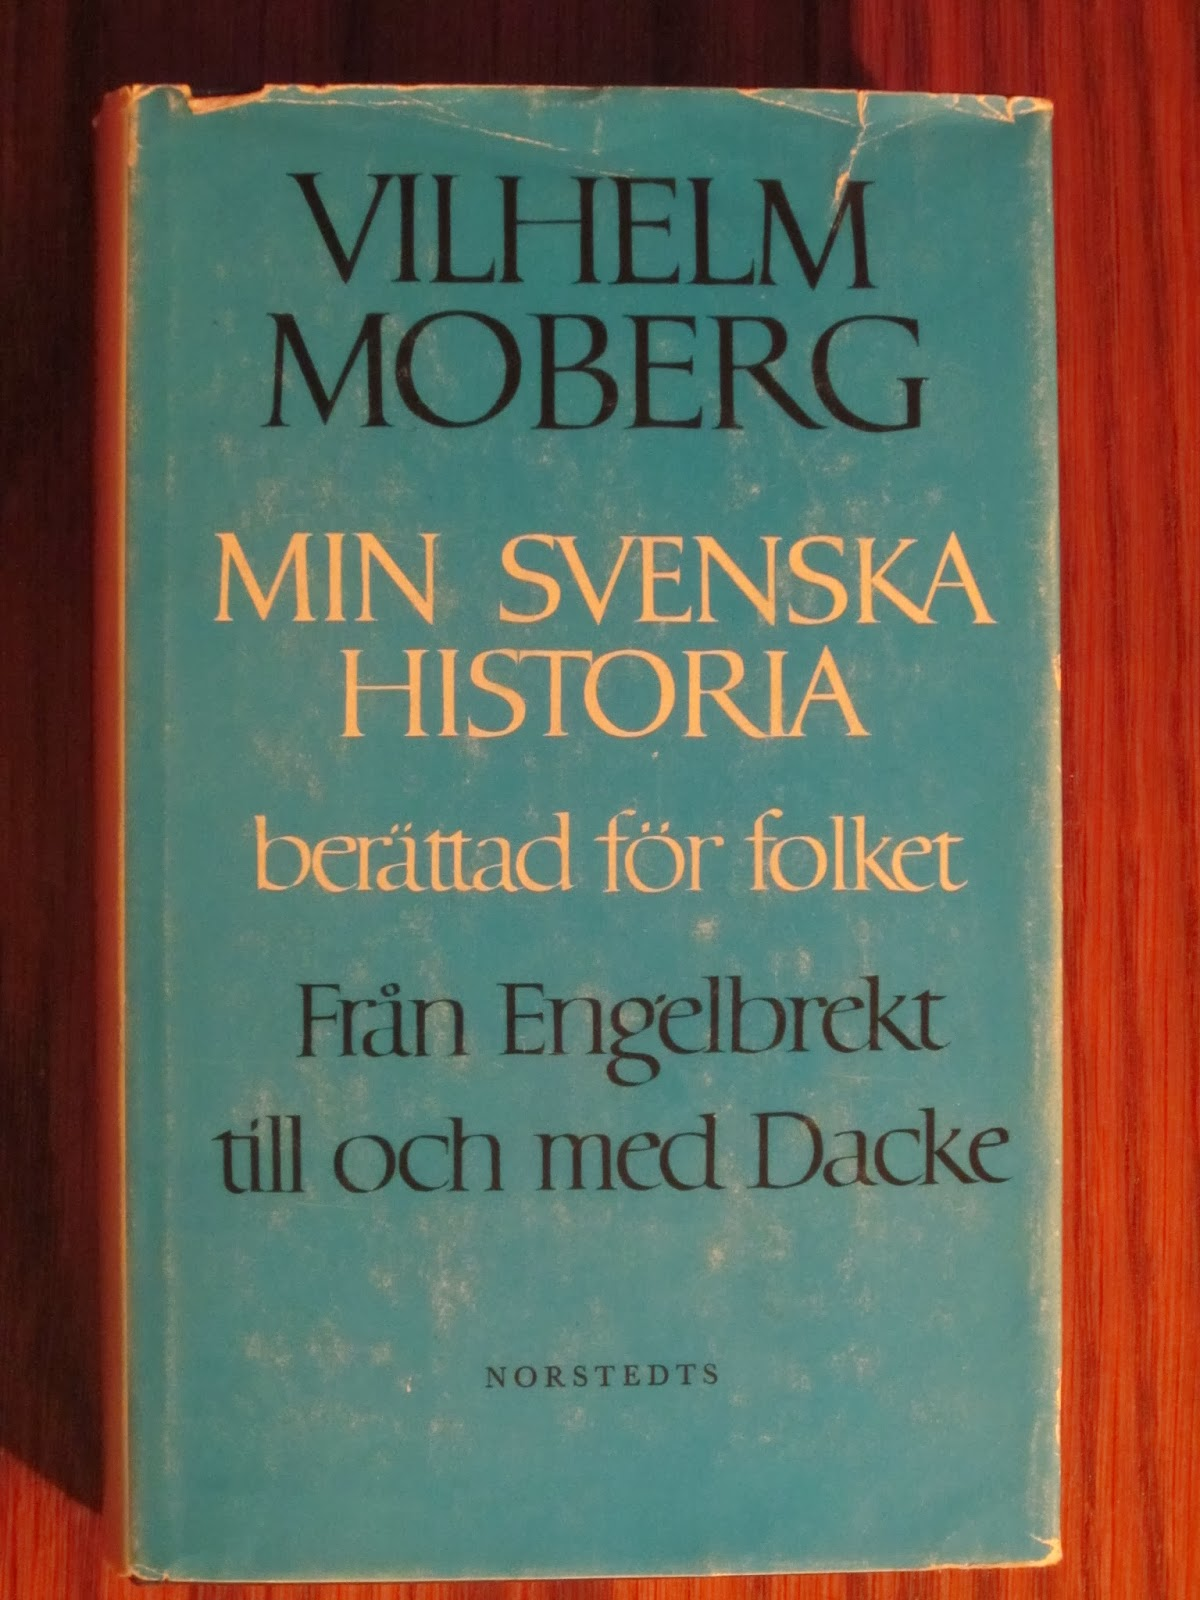 Image result for vilhelm moberg min svenska historia